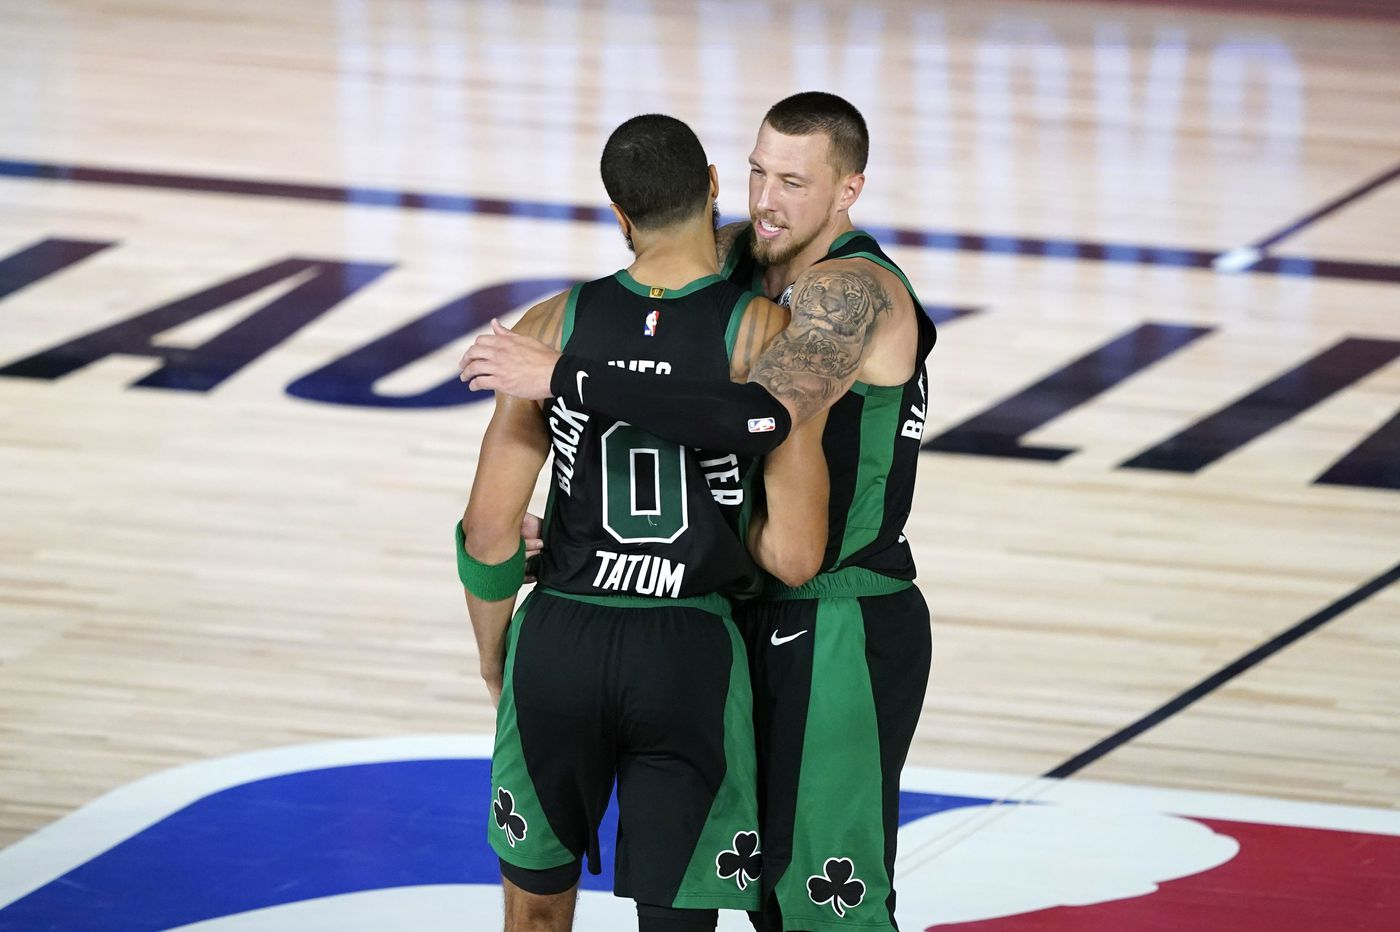 Sixers-Celtics best/worst: Jayson Tatum's historic night, Matisse Thybulle's stellar defense, Joel Embiid's lack of shots